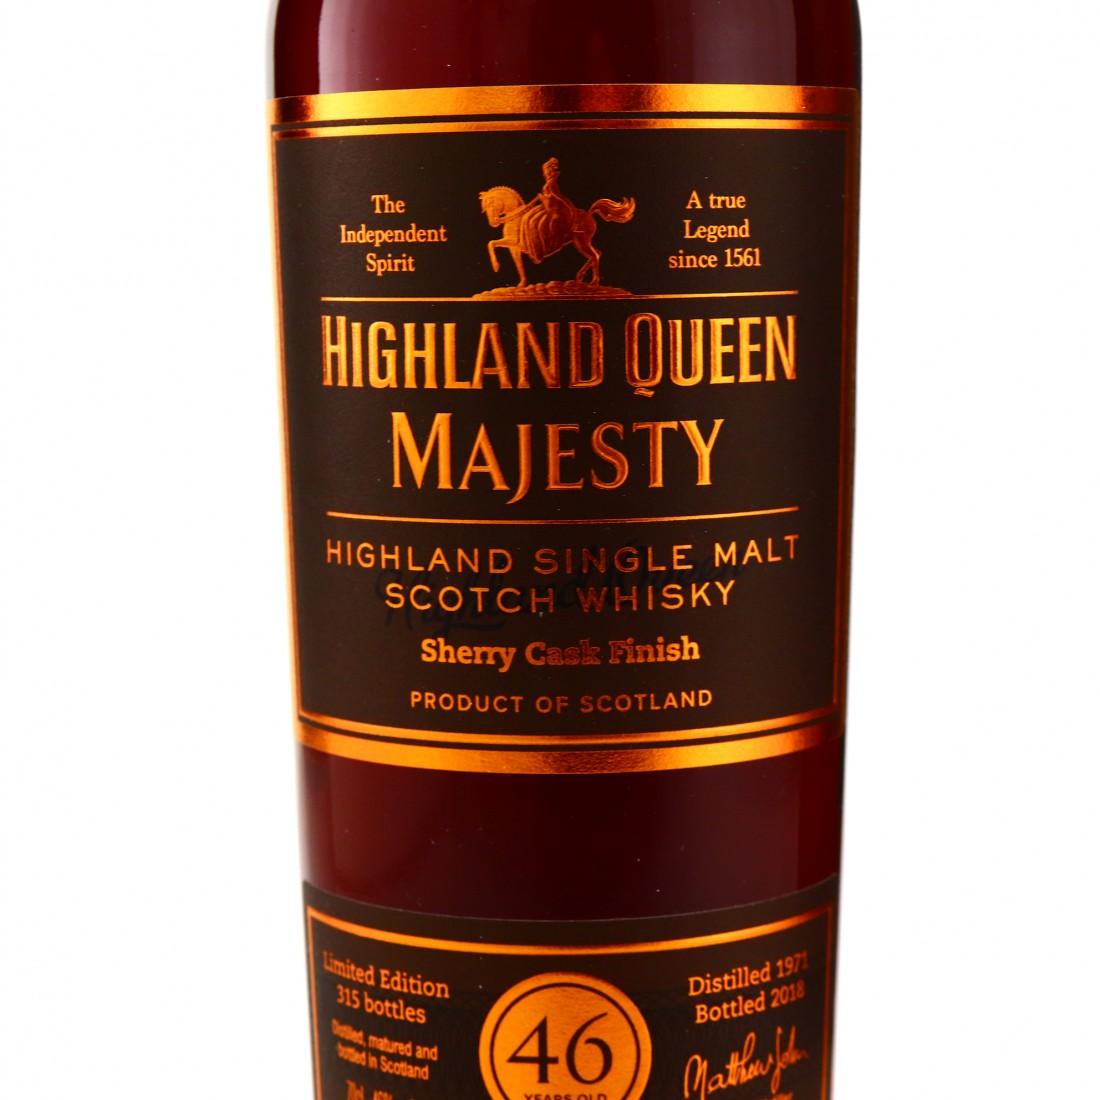 Highland Queen 1971 Majesty 46 Year Old Highland Single Malt